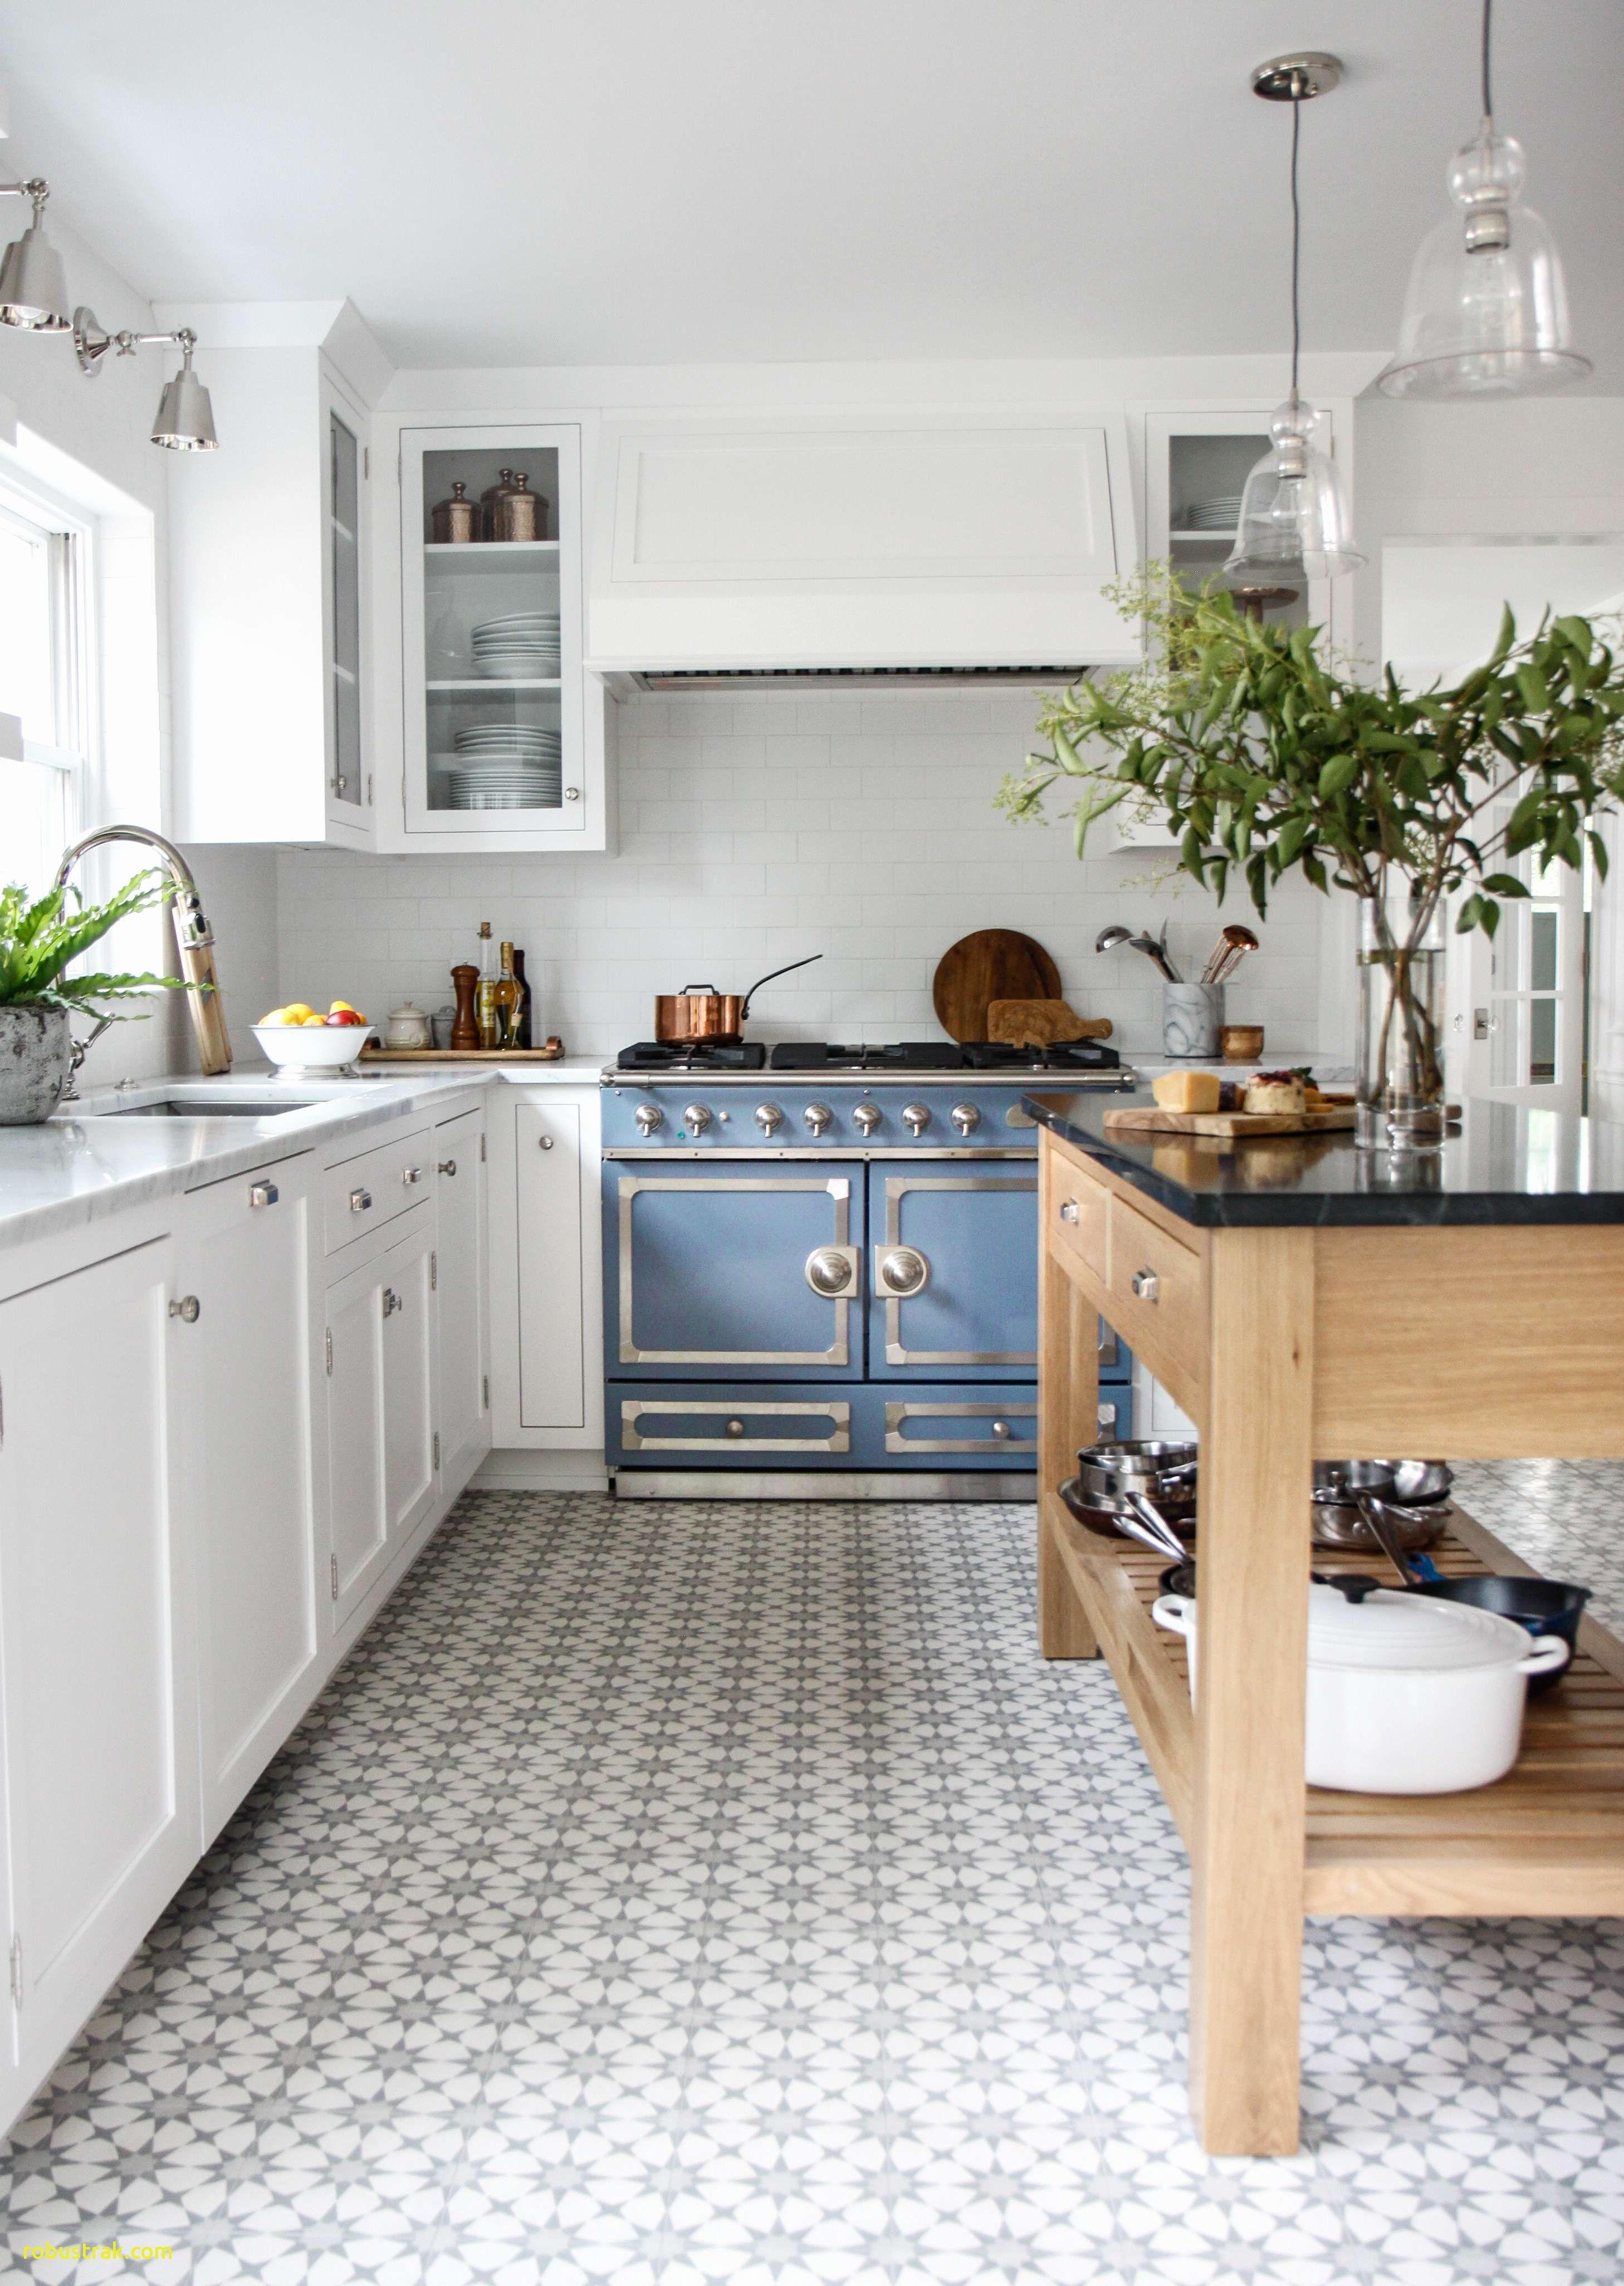 9 where to Buy Kitchen Backsplash Images   Kitchen design small ...